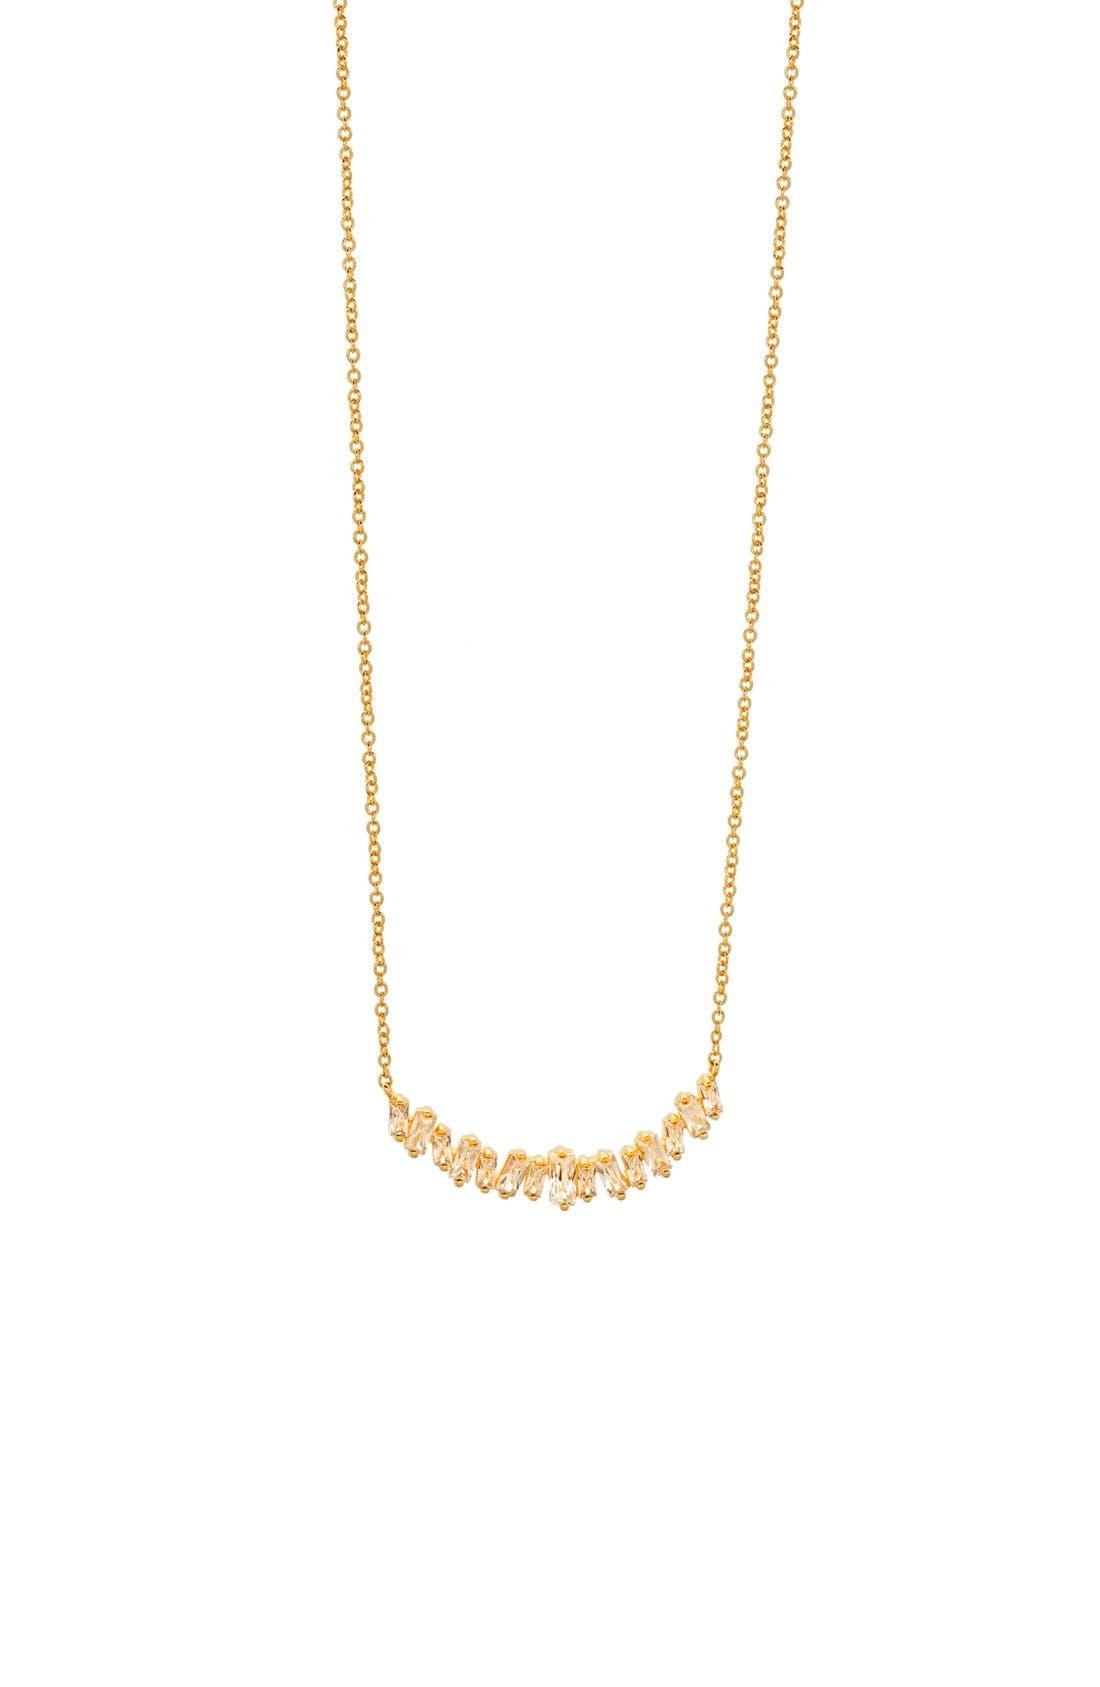 Amara Collar Necklace,                             Main thumbnail 1, color,                             710